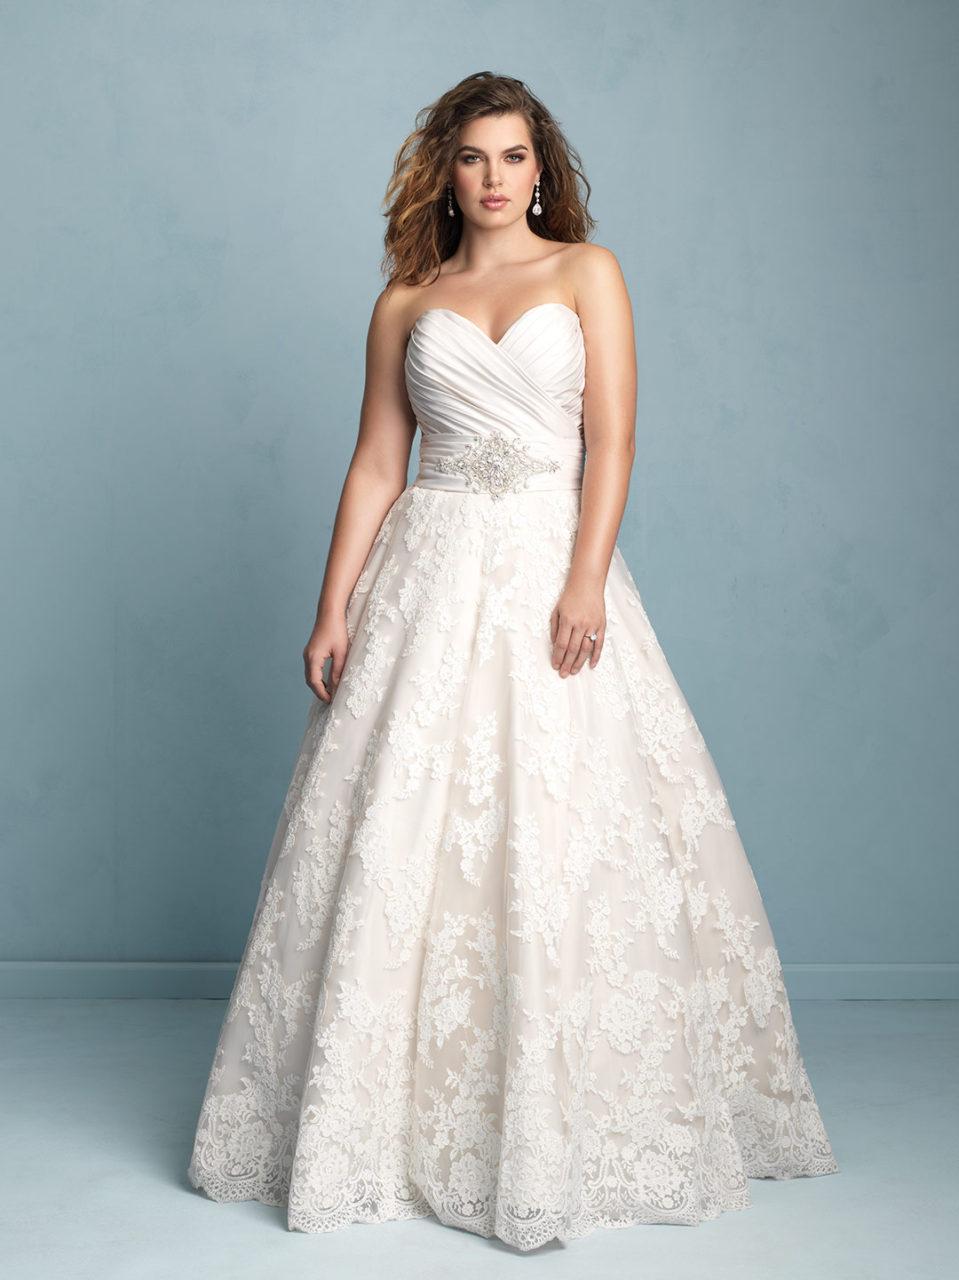 allure plus size wedding dresses photo - 1